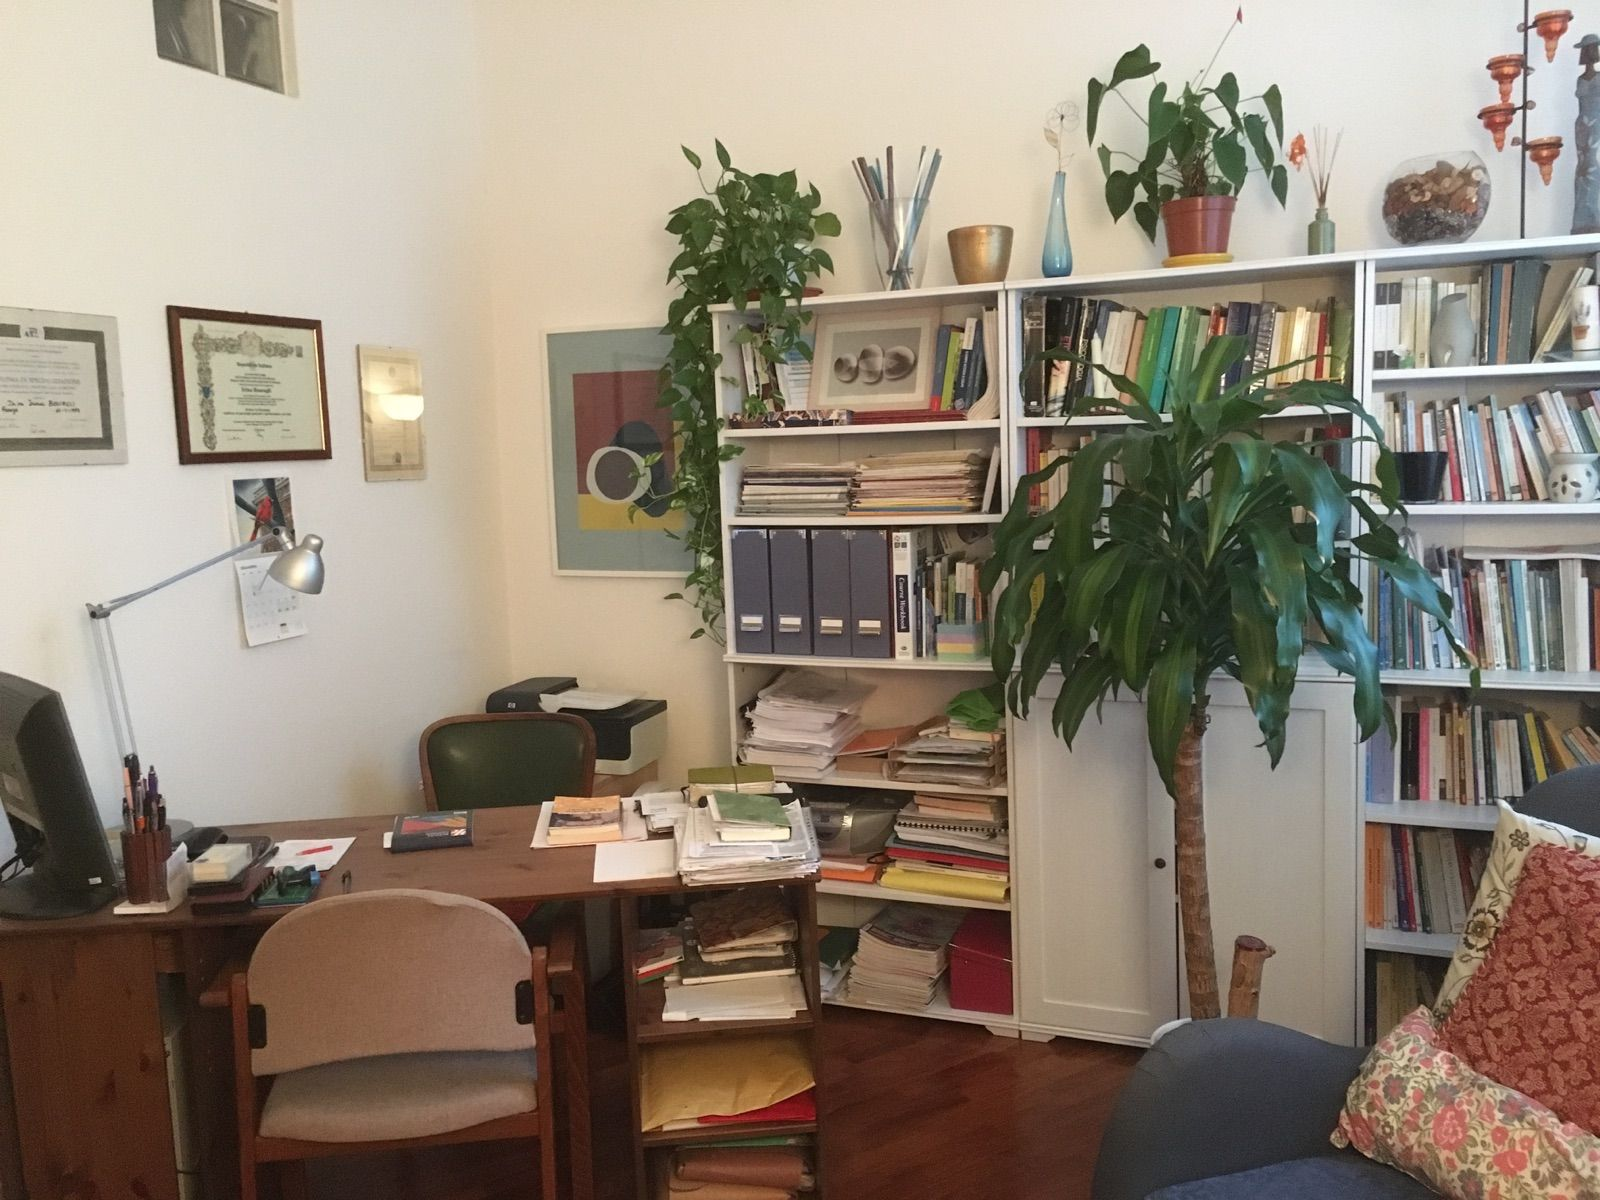 Arredamento Studio ~ Dr.ssa irina boscagli: le foto dei miei studi arredamento studio